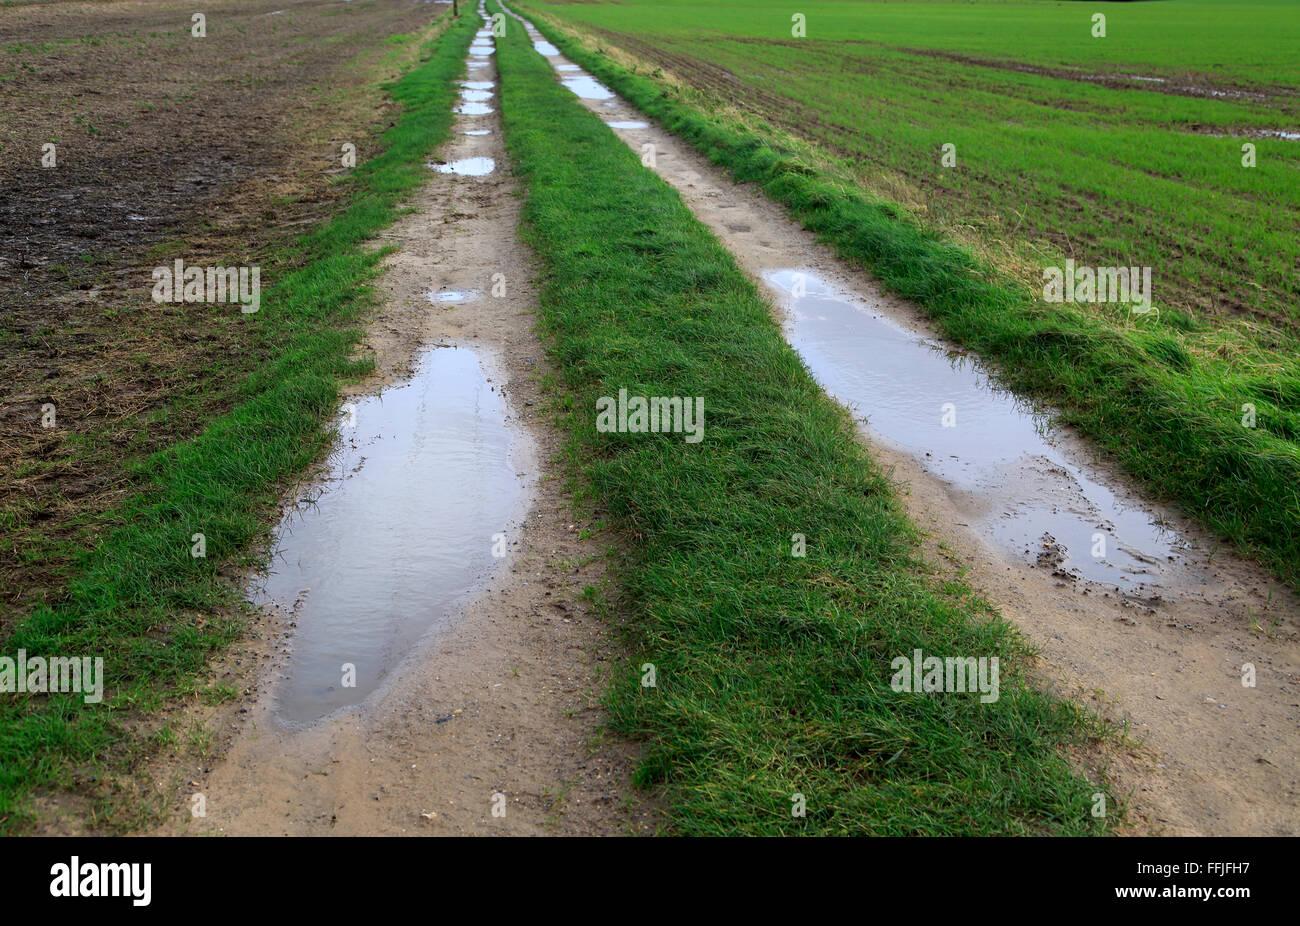 Puddles in farm track crossing fields, Alderton, Suffolk, England, UK - Stock Image